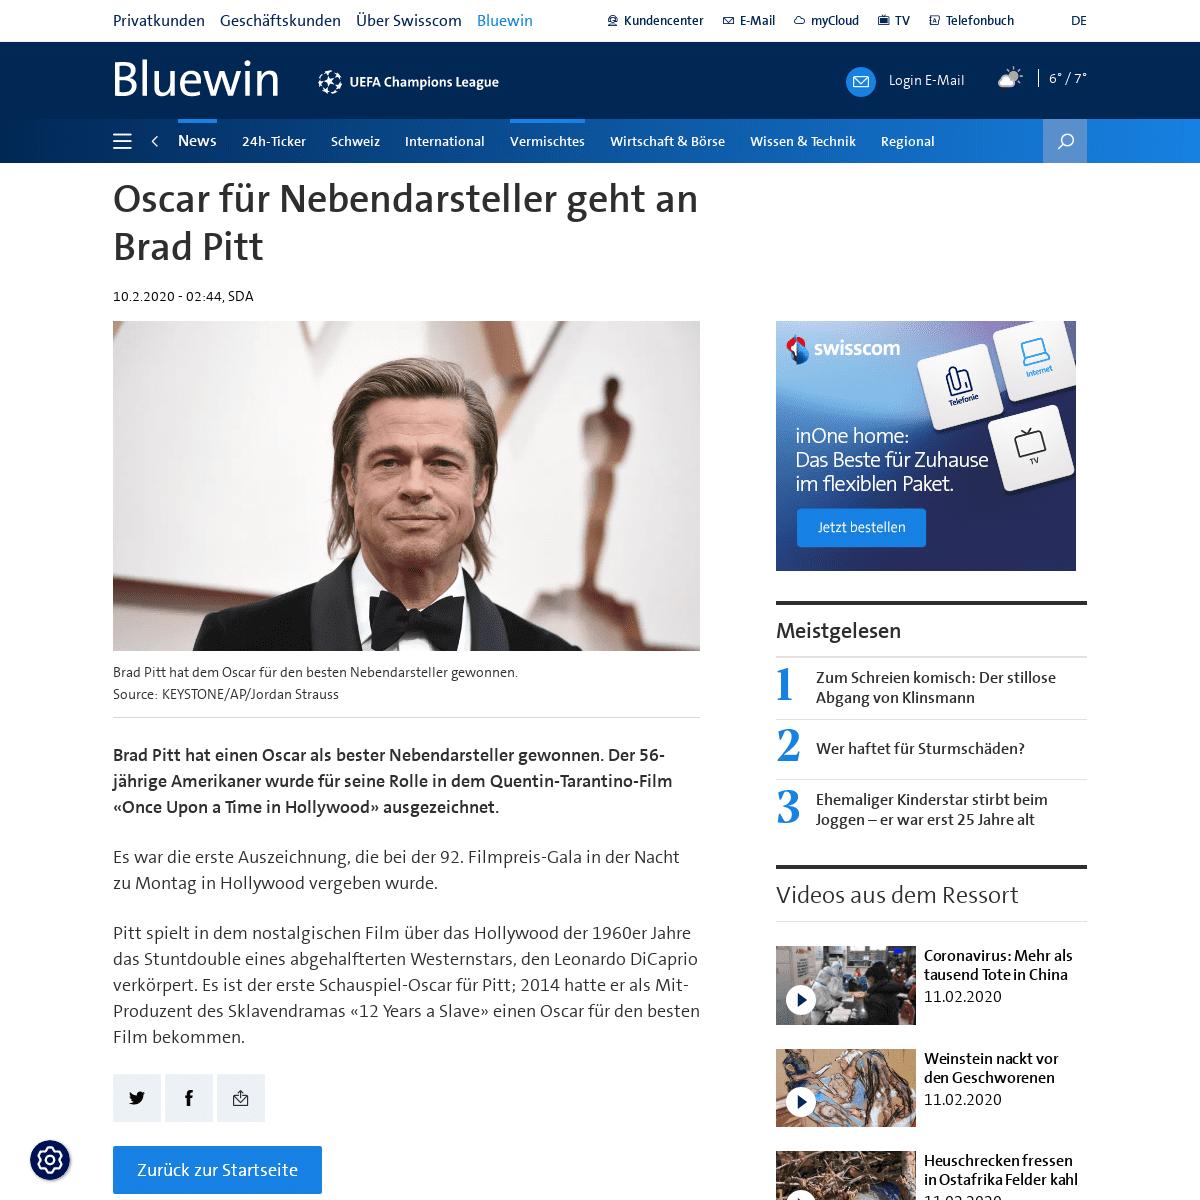 Oscar für Nebendarsteller geht an Brad Pitt